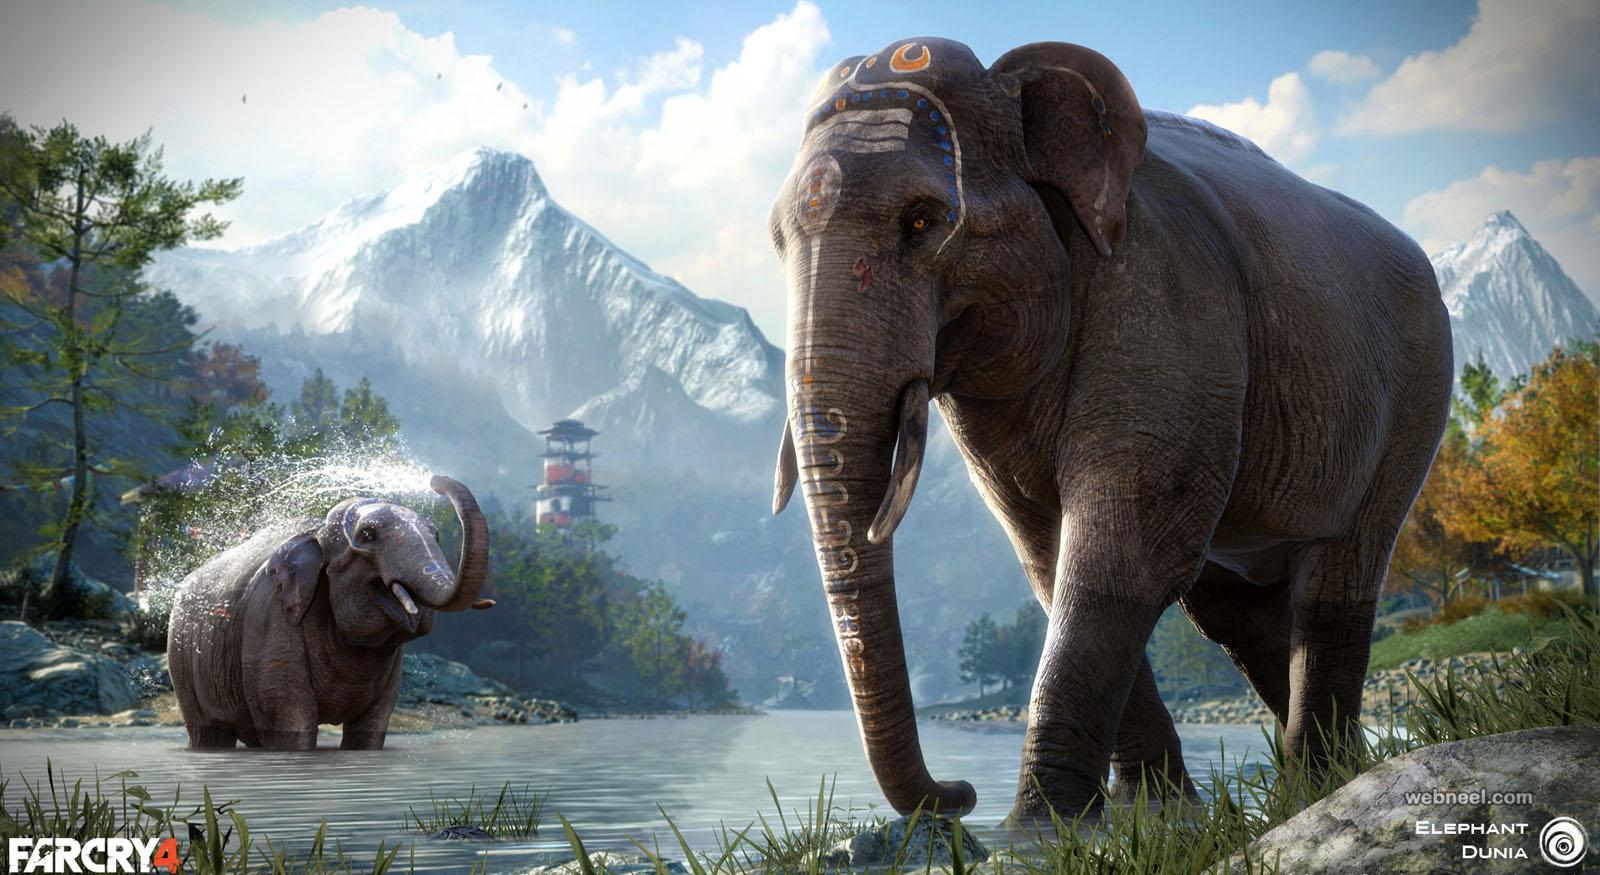 elephant zbrush 3d model by jason mark